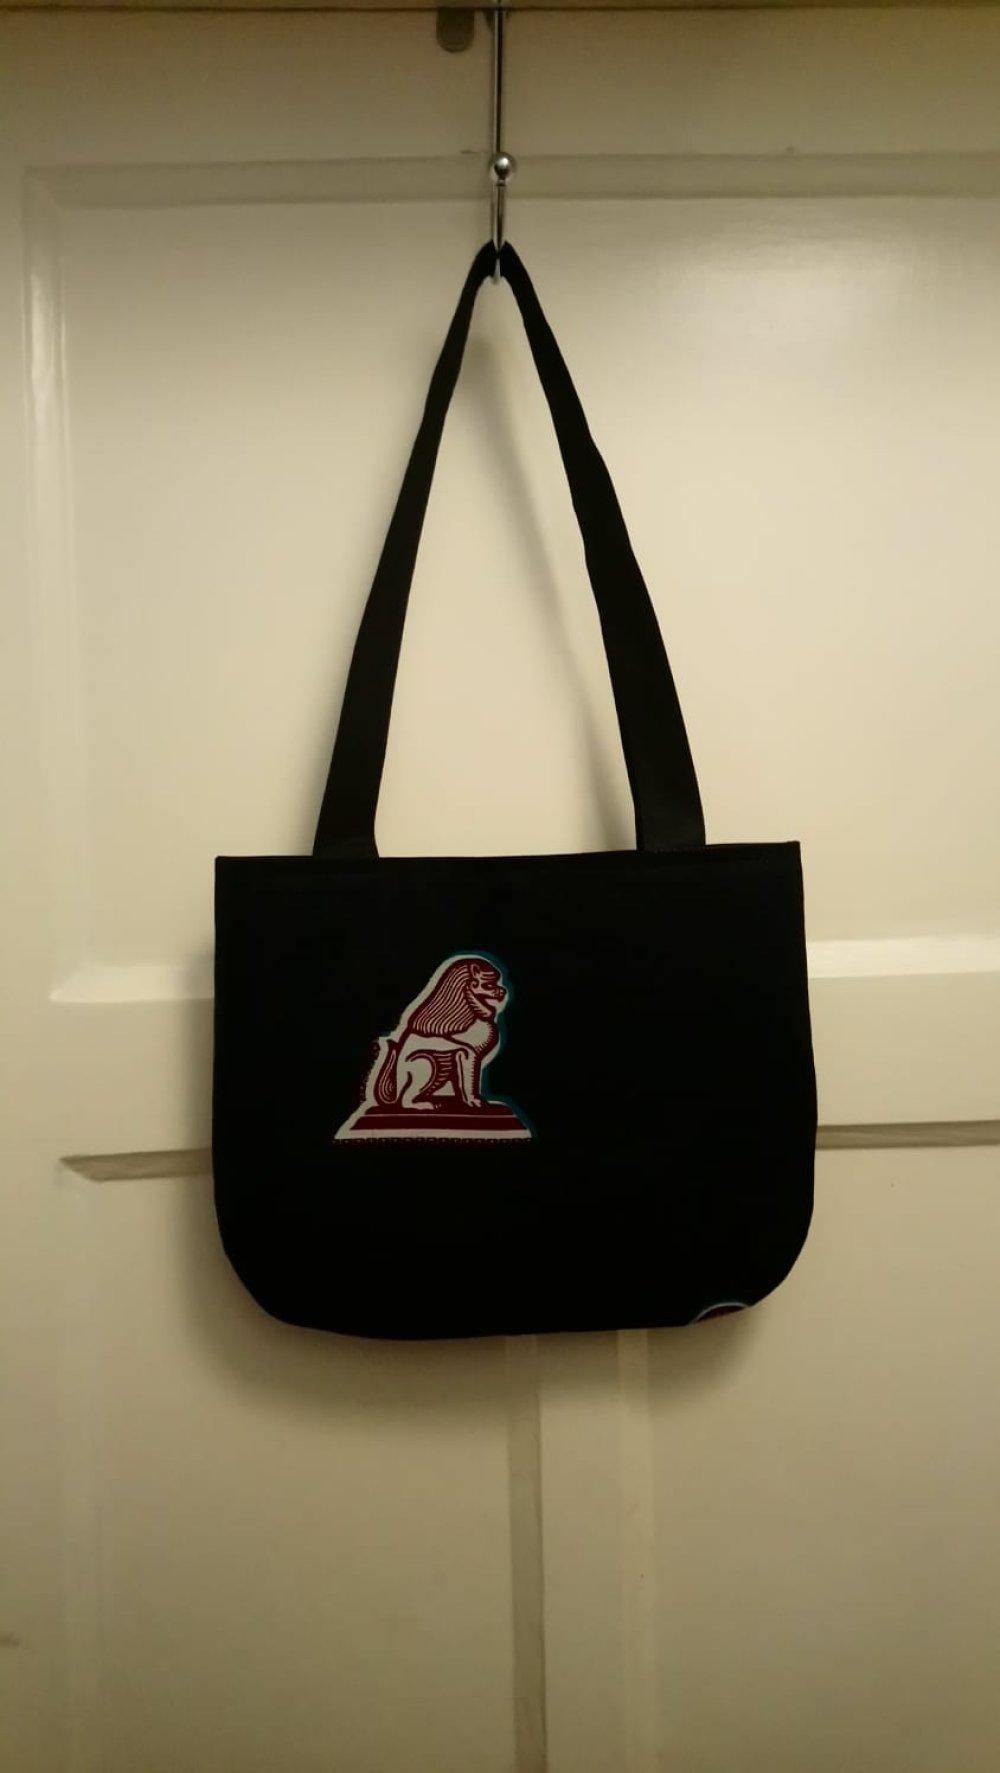 Joli sac doublé en Wax - Tote bag  30.5 x 24.5 cm